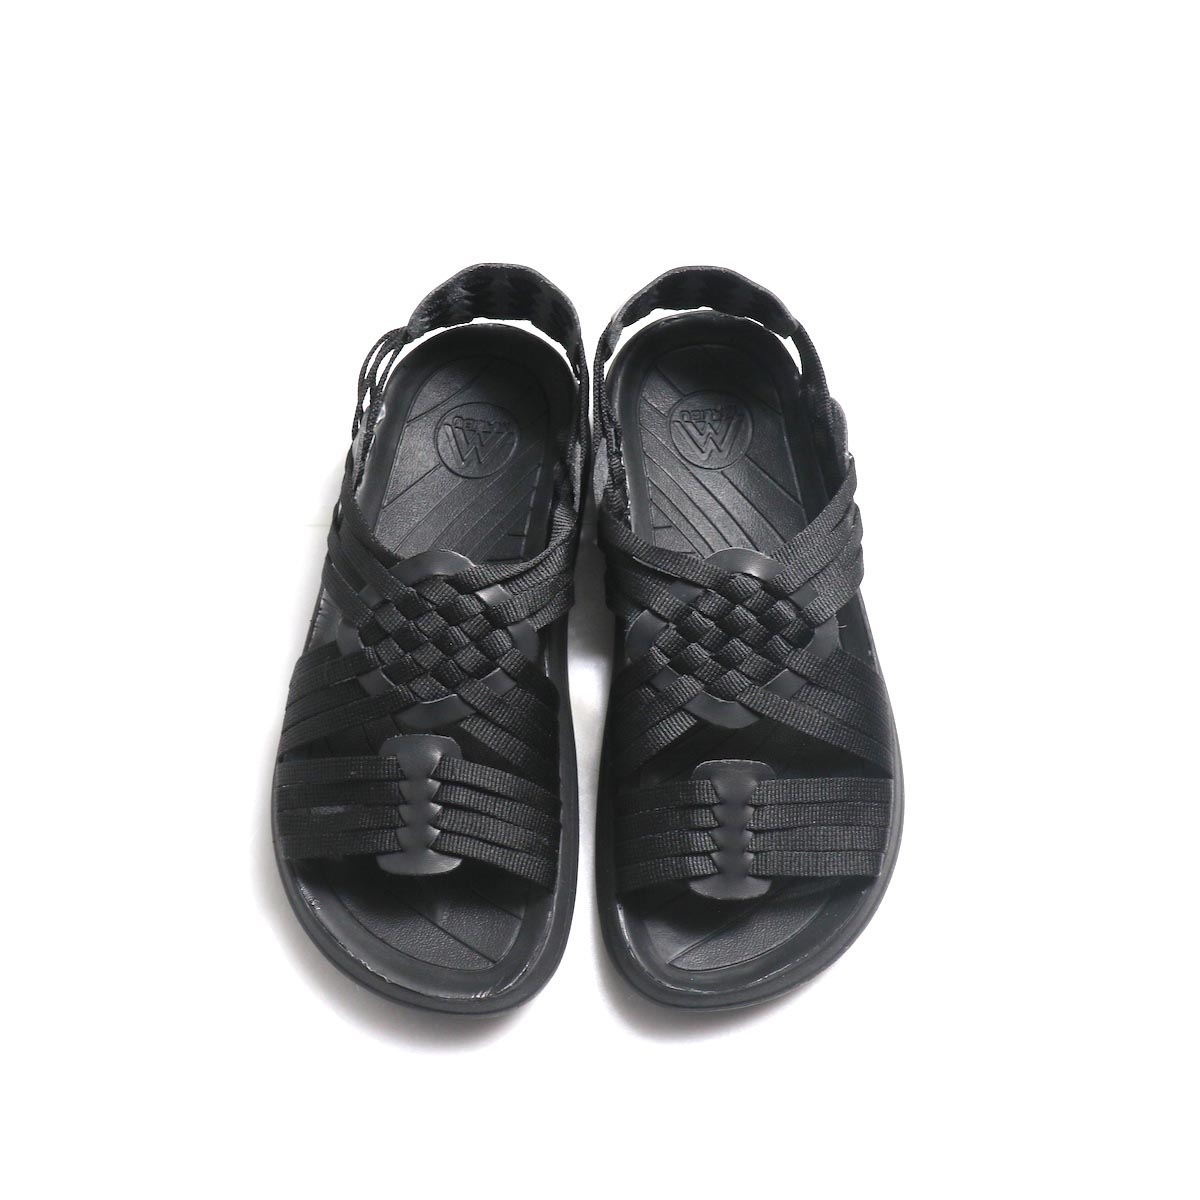 Malibu Sandals / Canyon (Nylon Weave) -Black 上